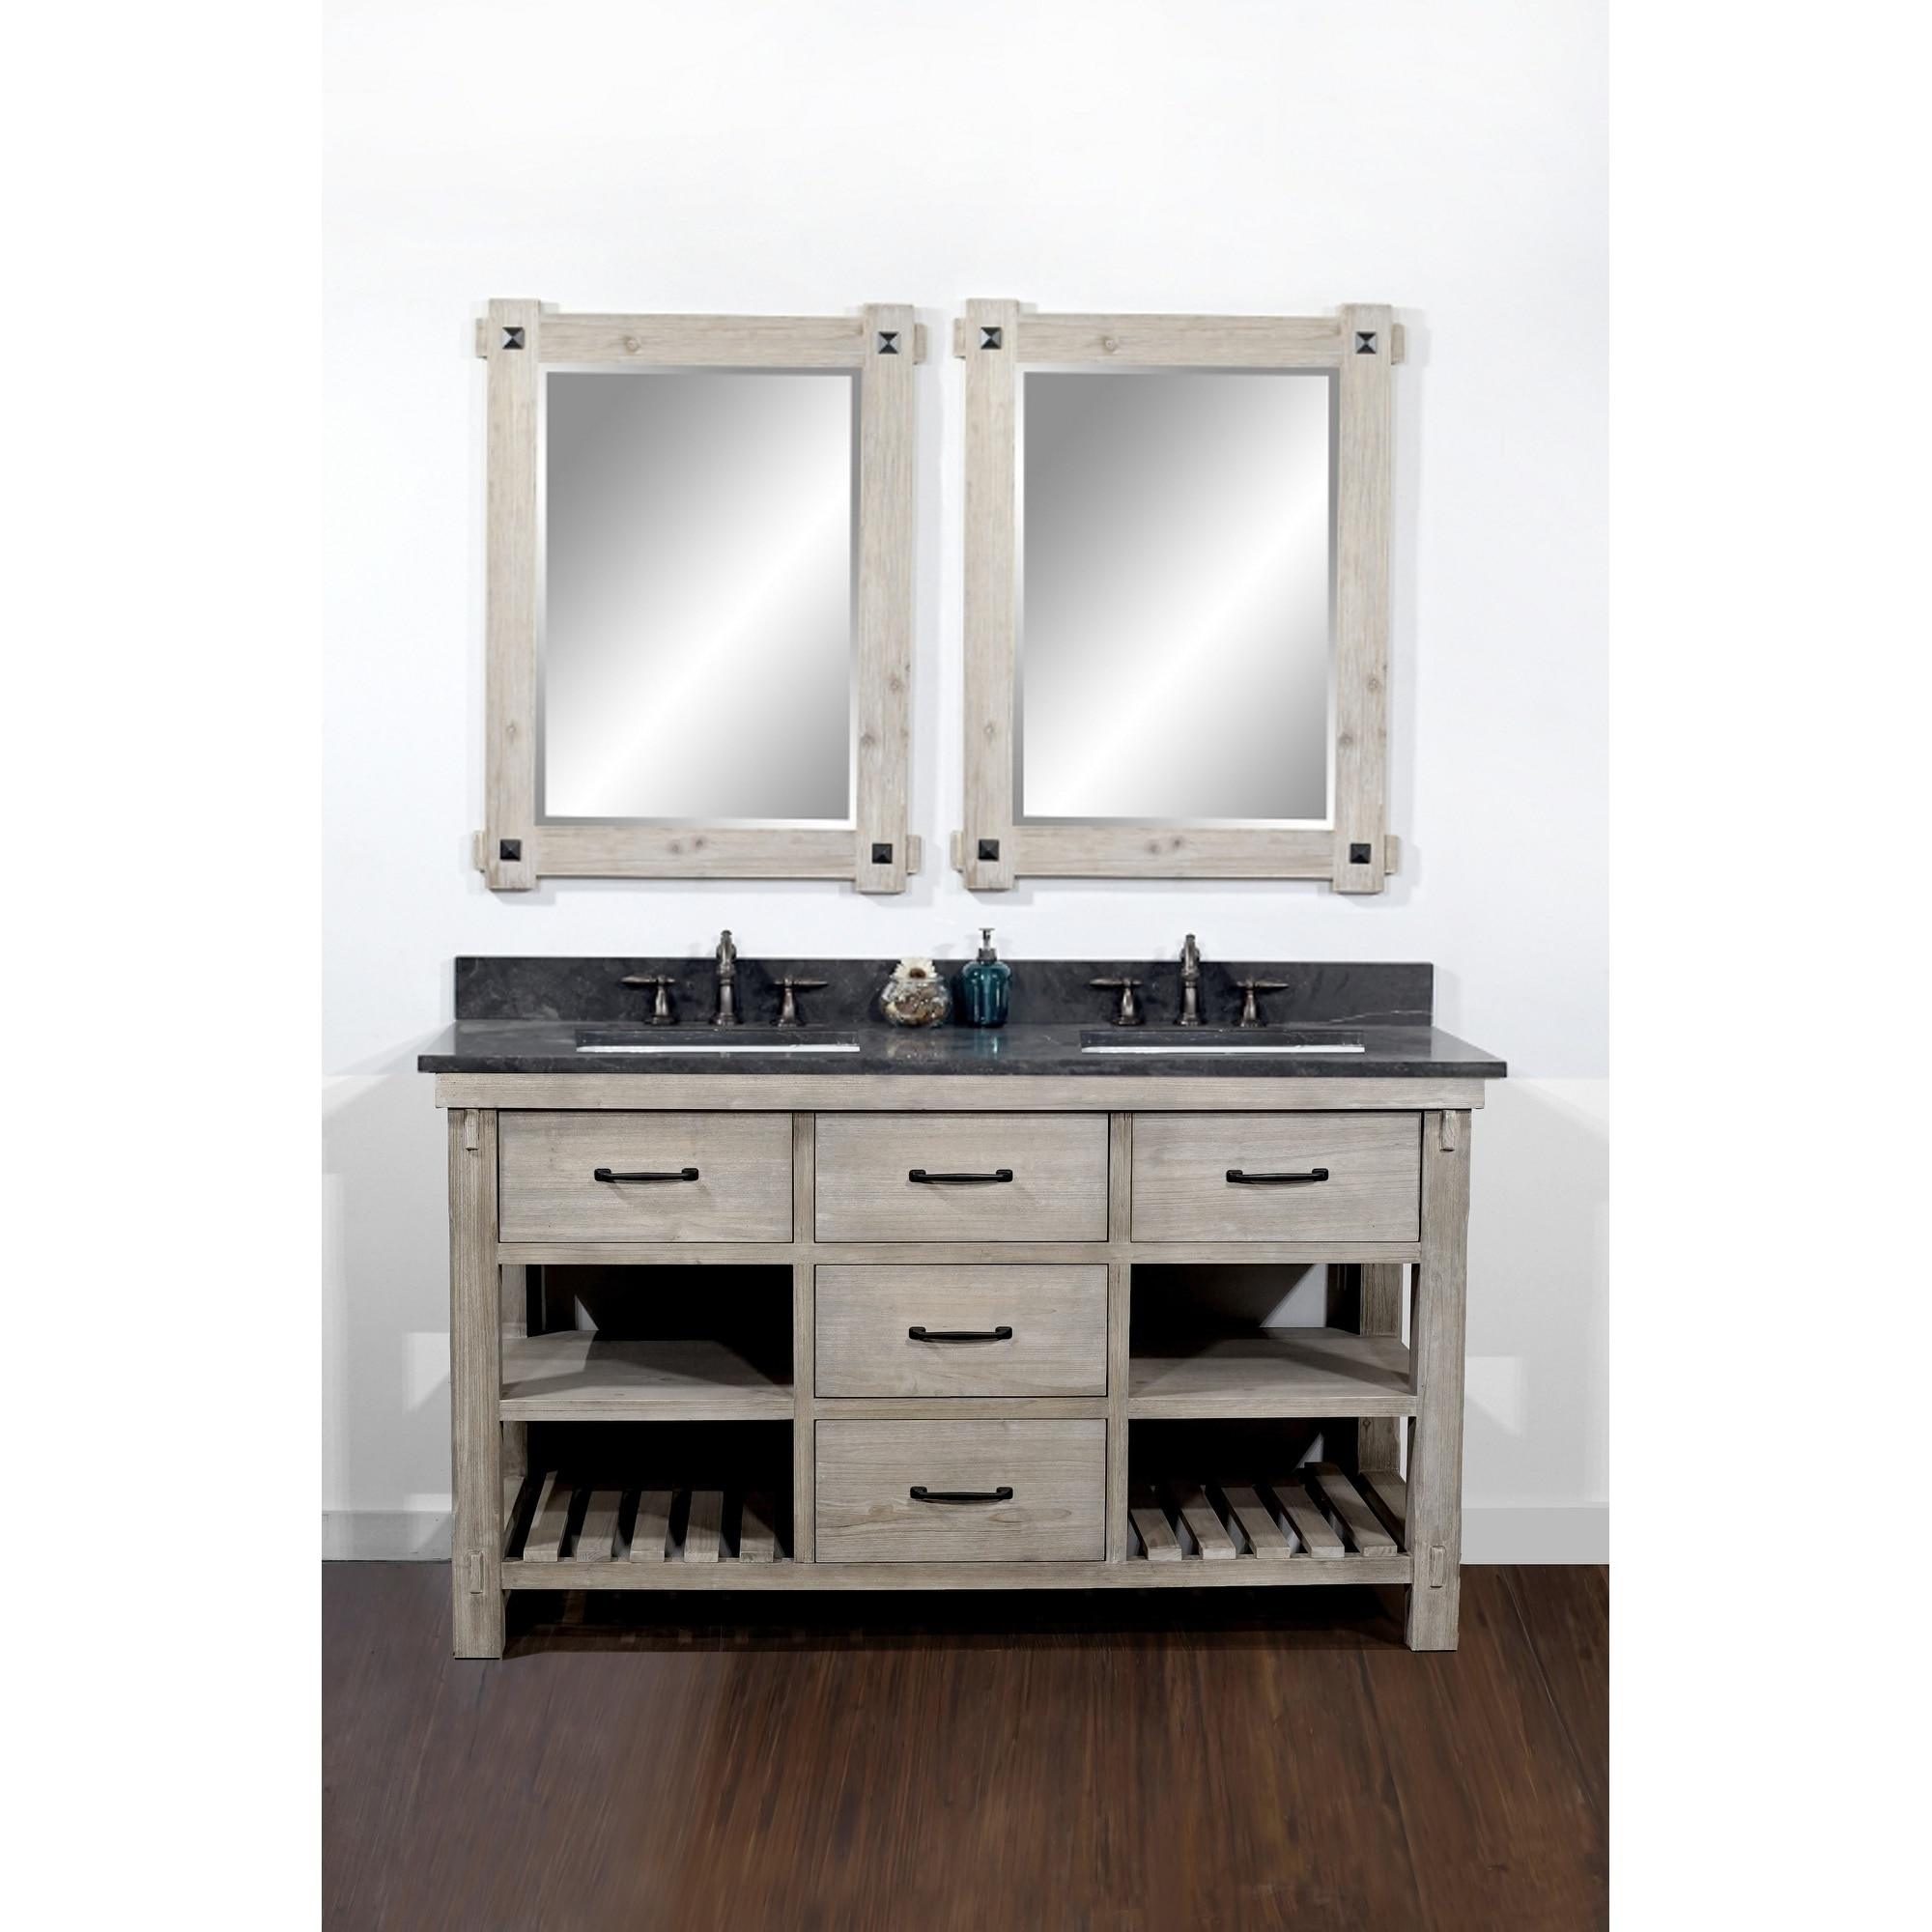 Rustic Style 60-inch Double Sink Bathroom Vanity with Dark ...